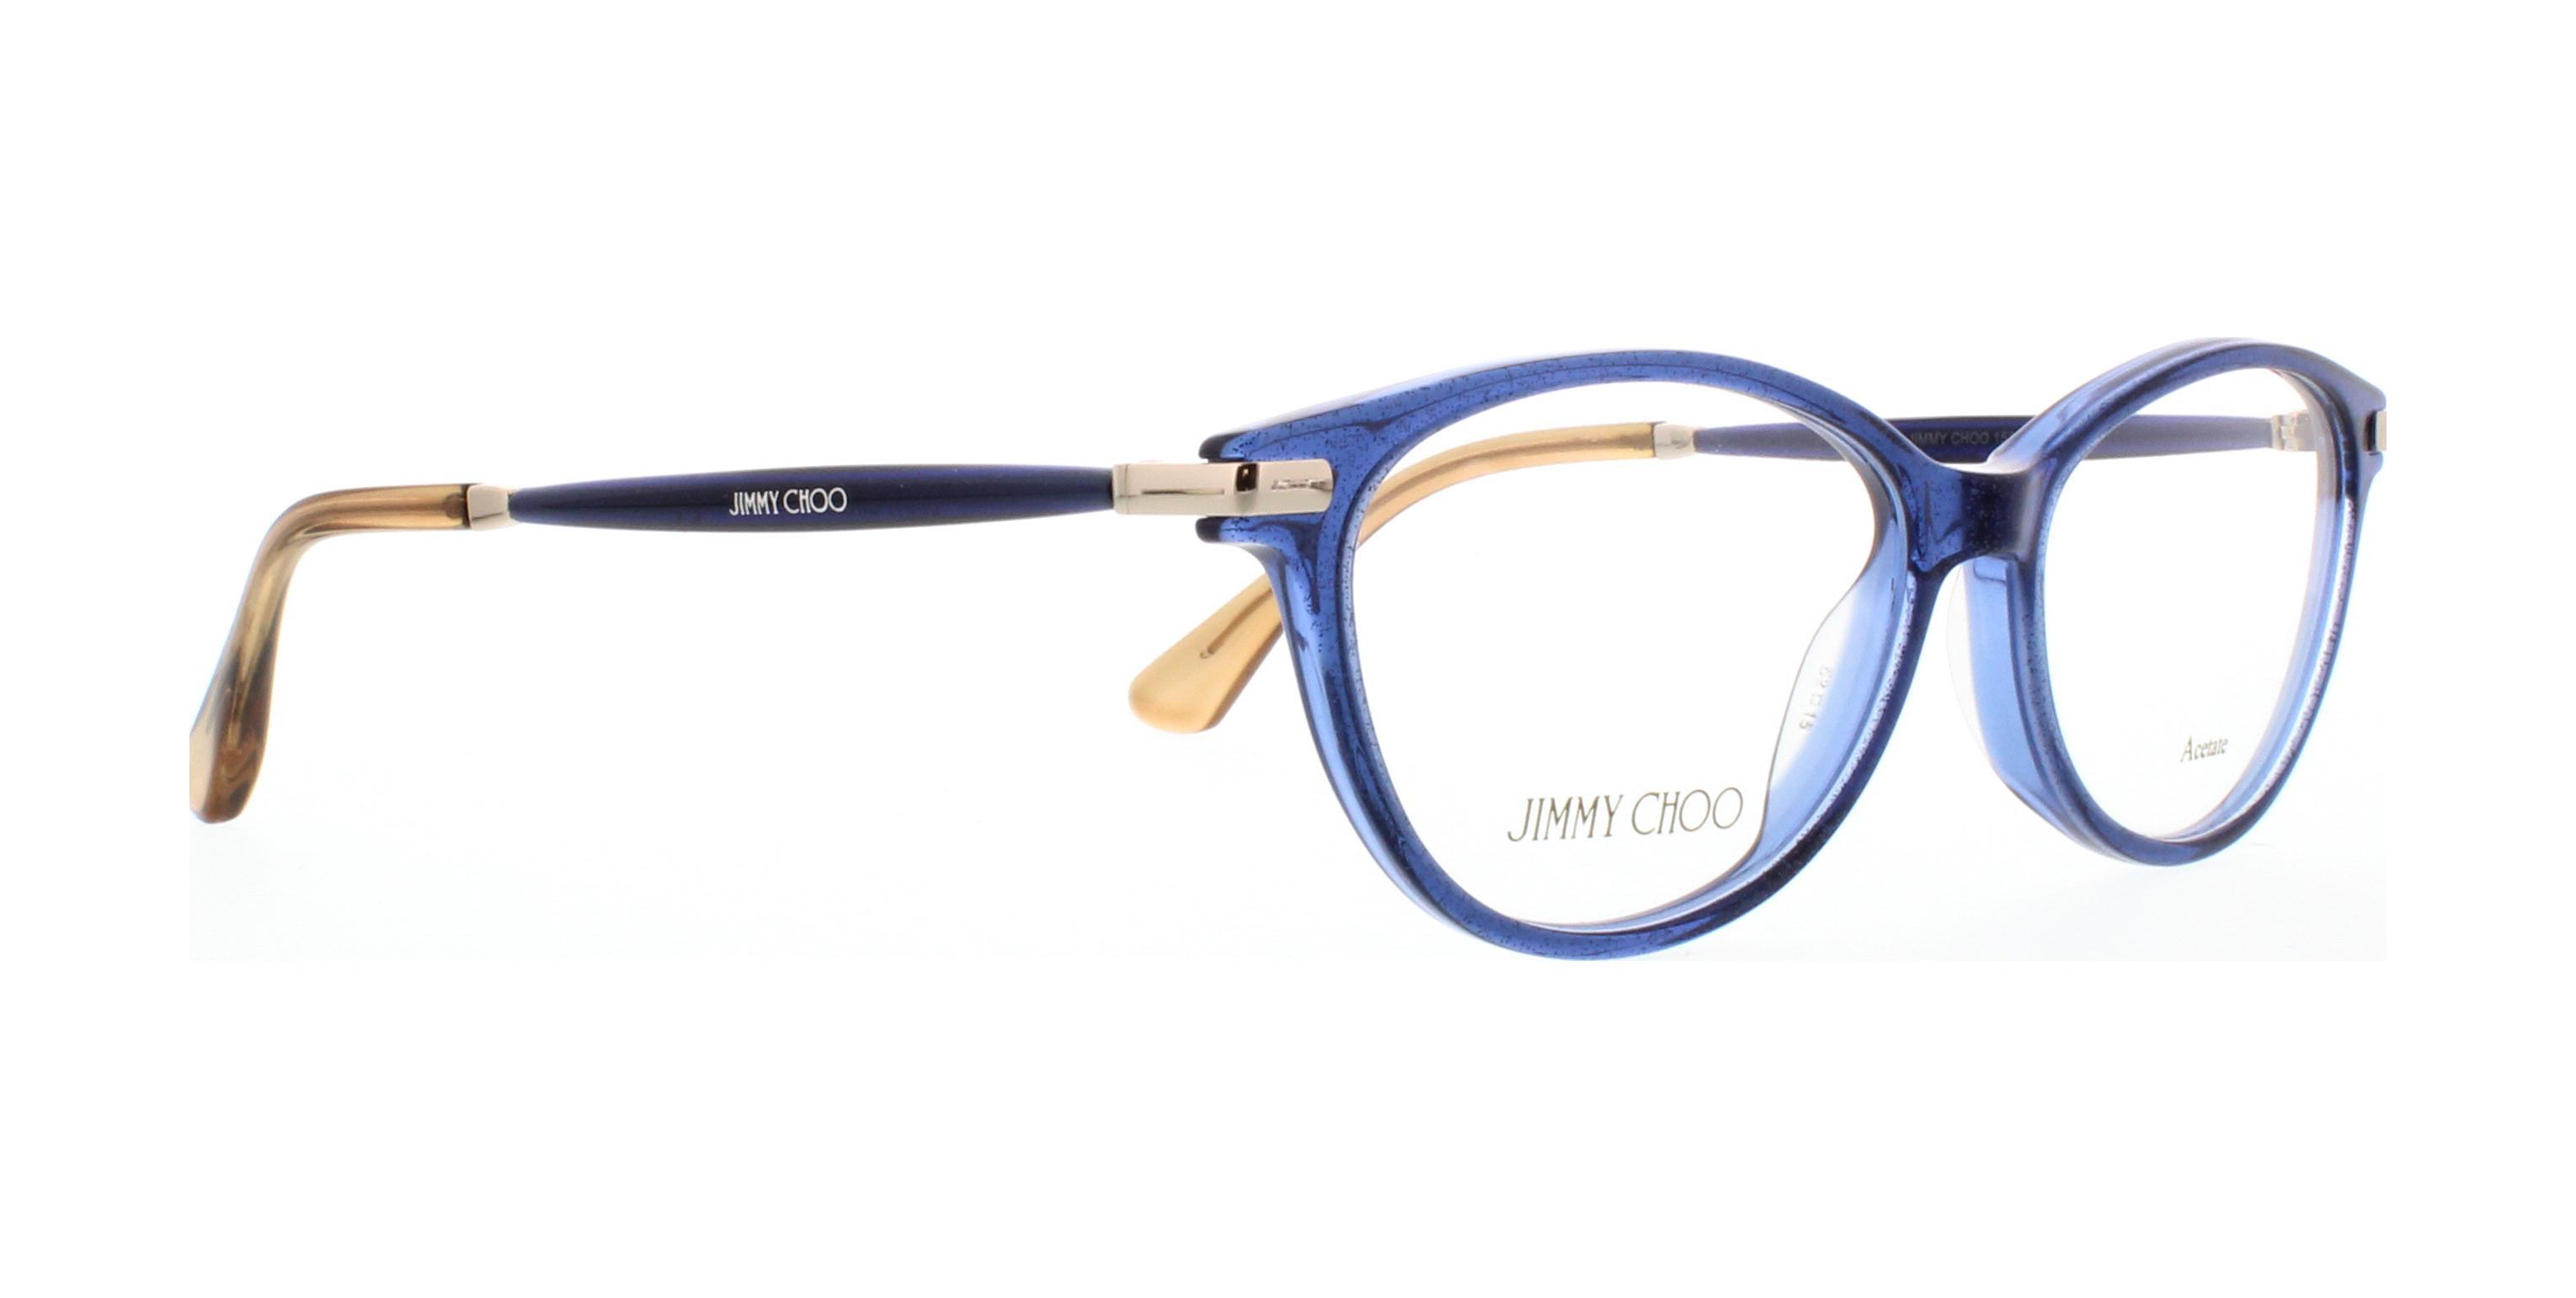 5537b8ac5b8 Designer Frames Outlet. Jimmy Choo 153